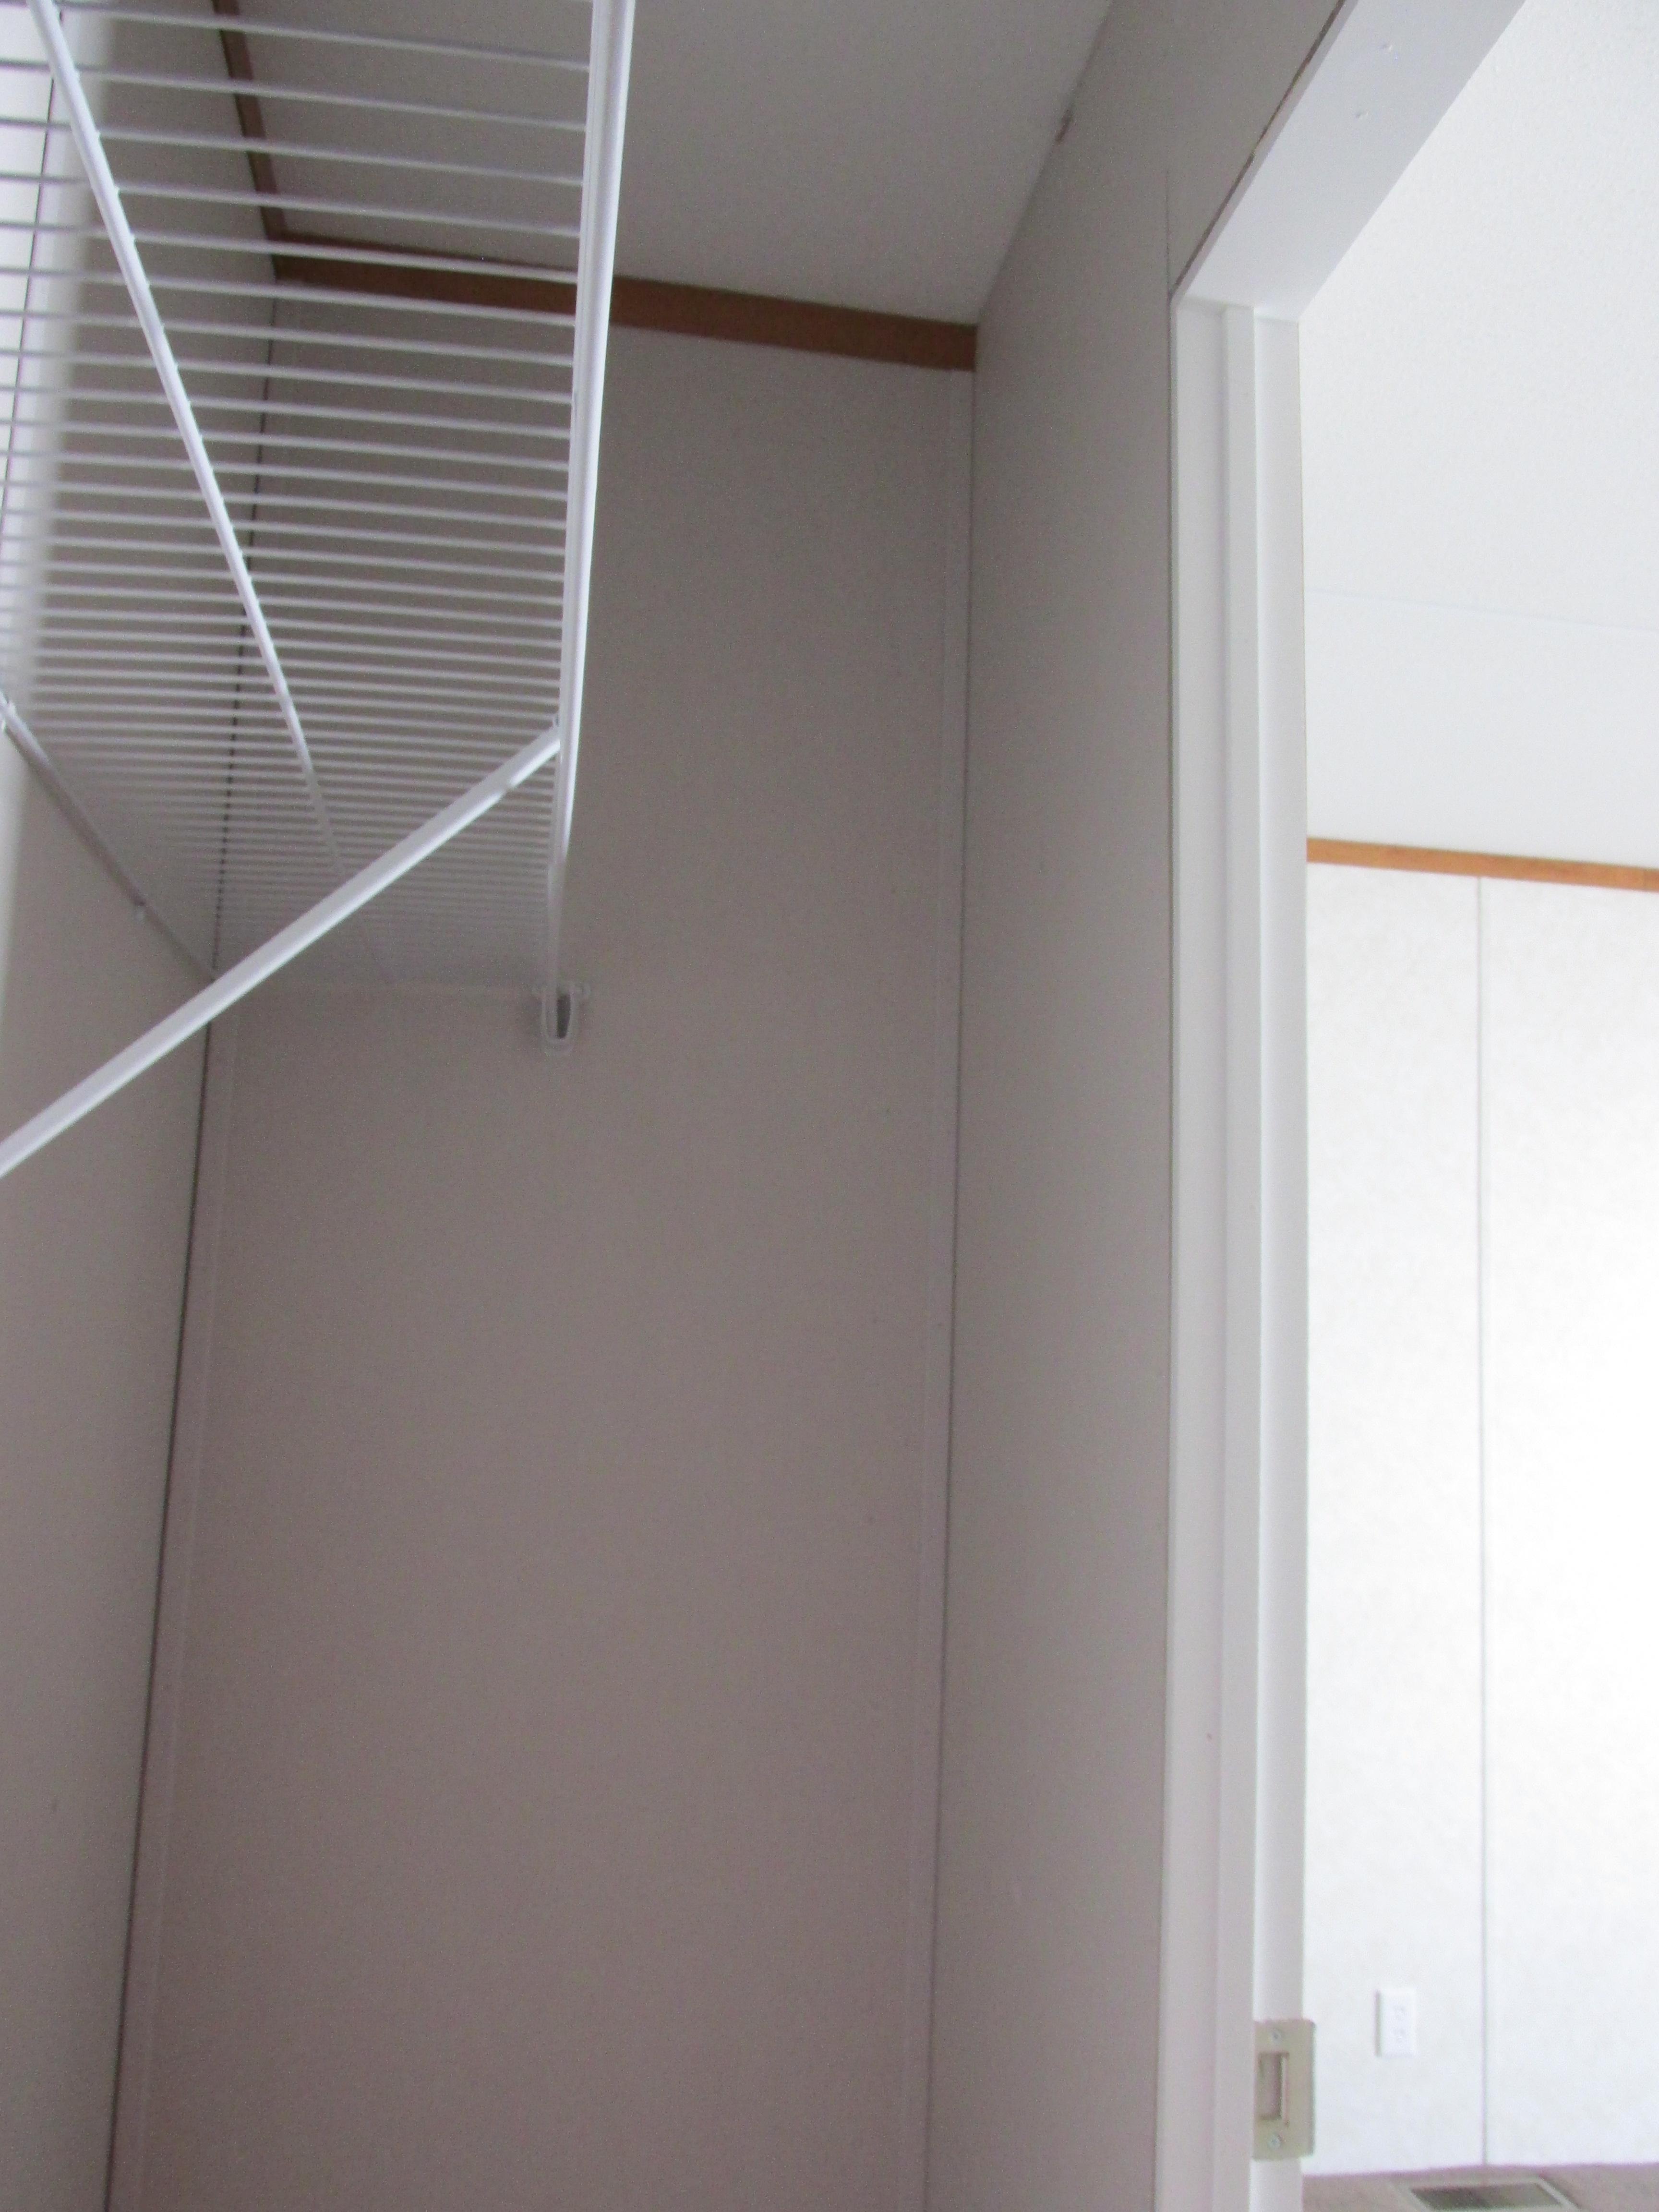 400 Bedroom#2 Closet.JPG